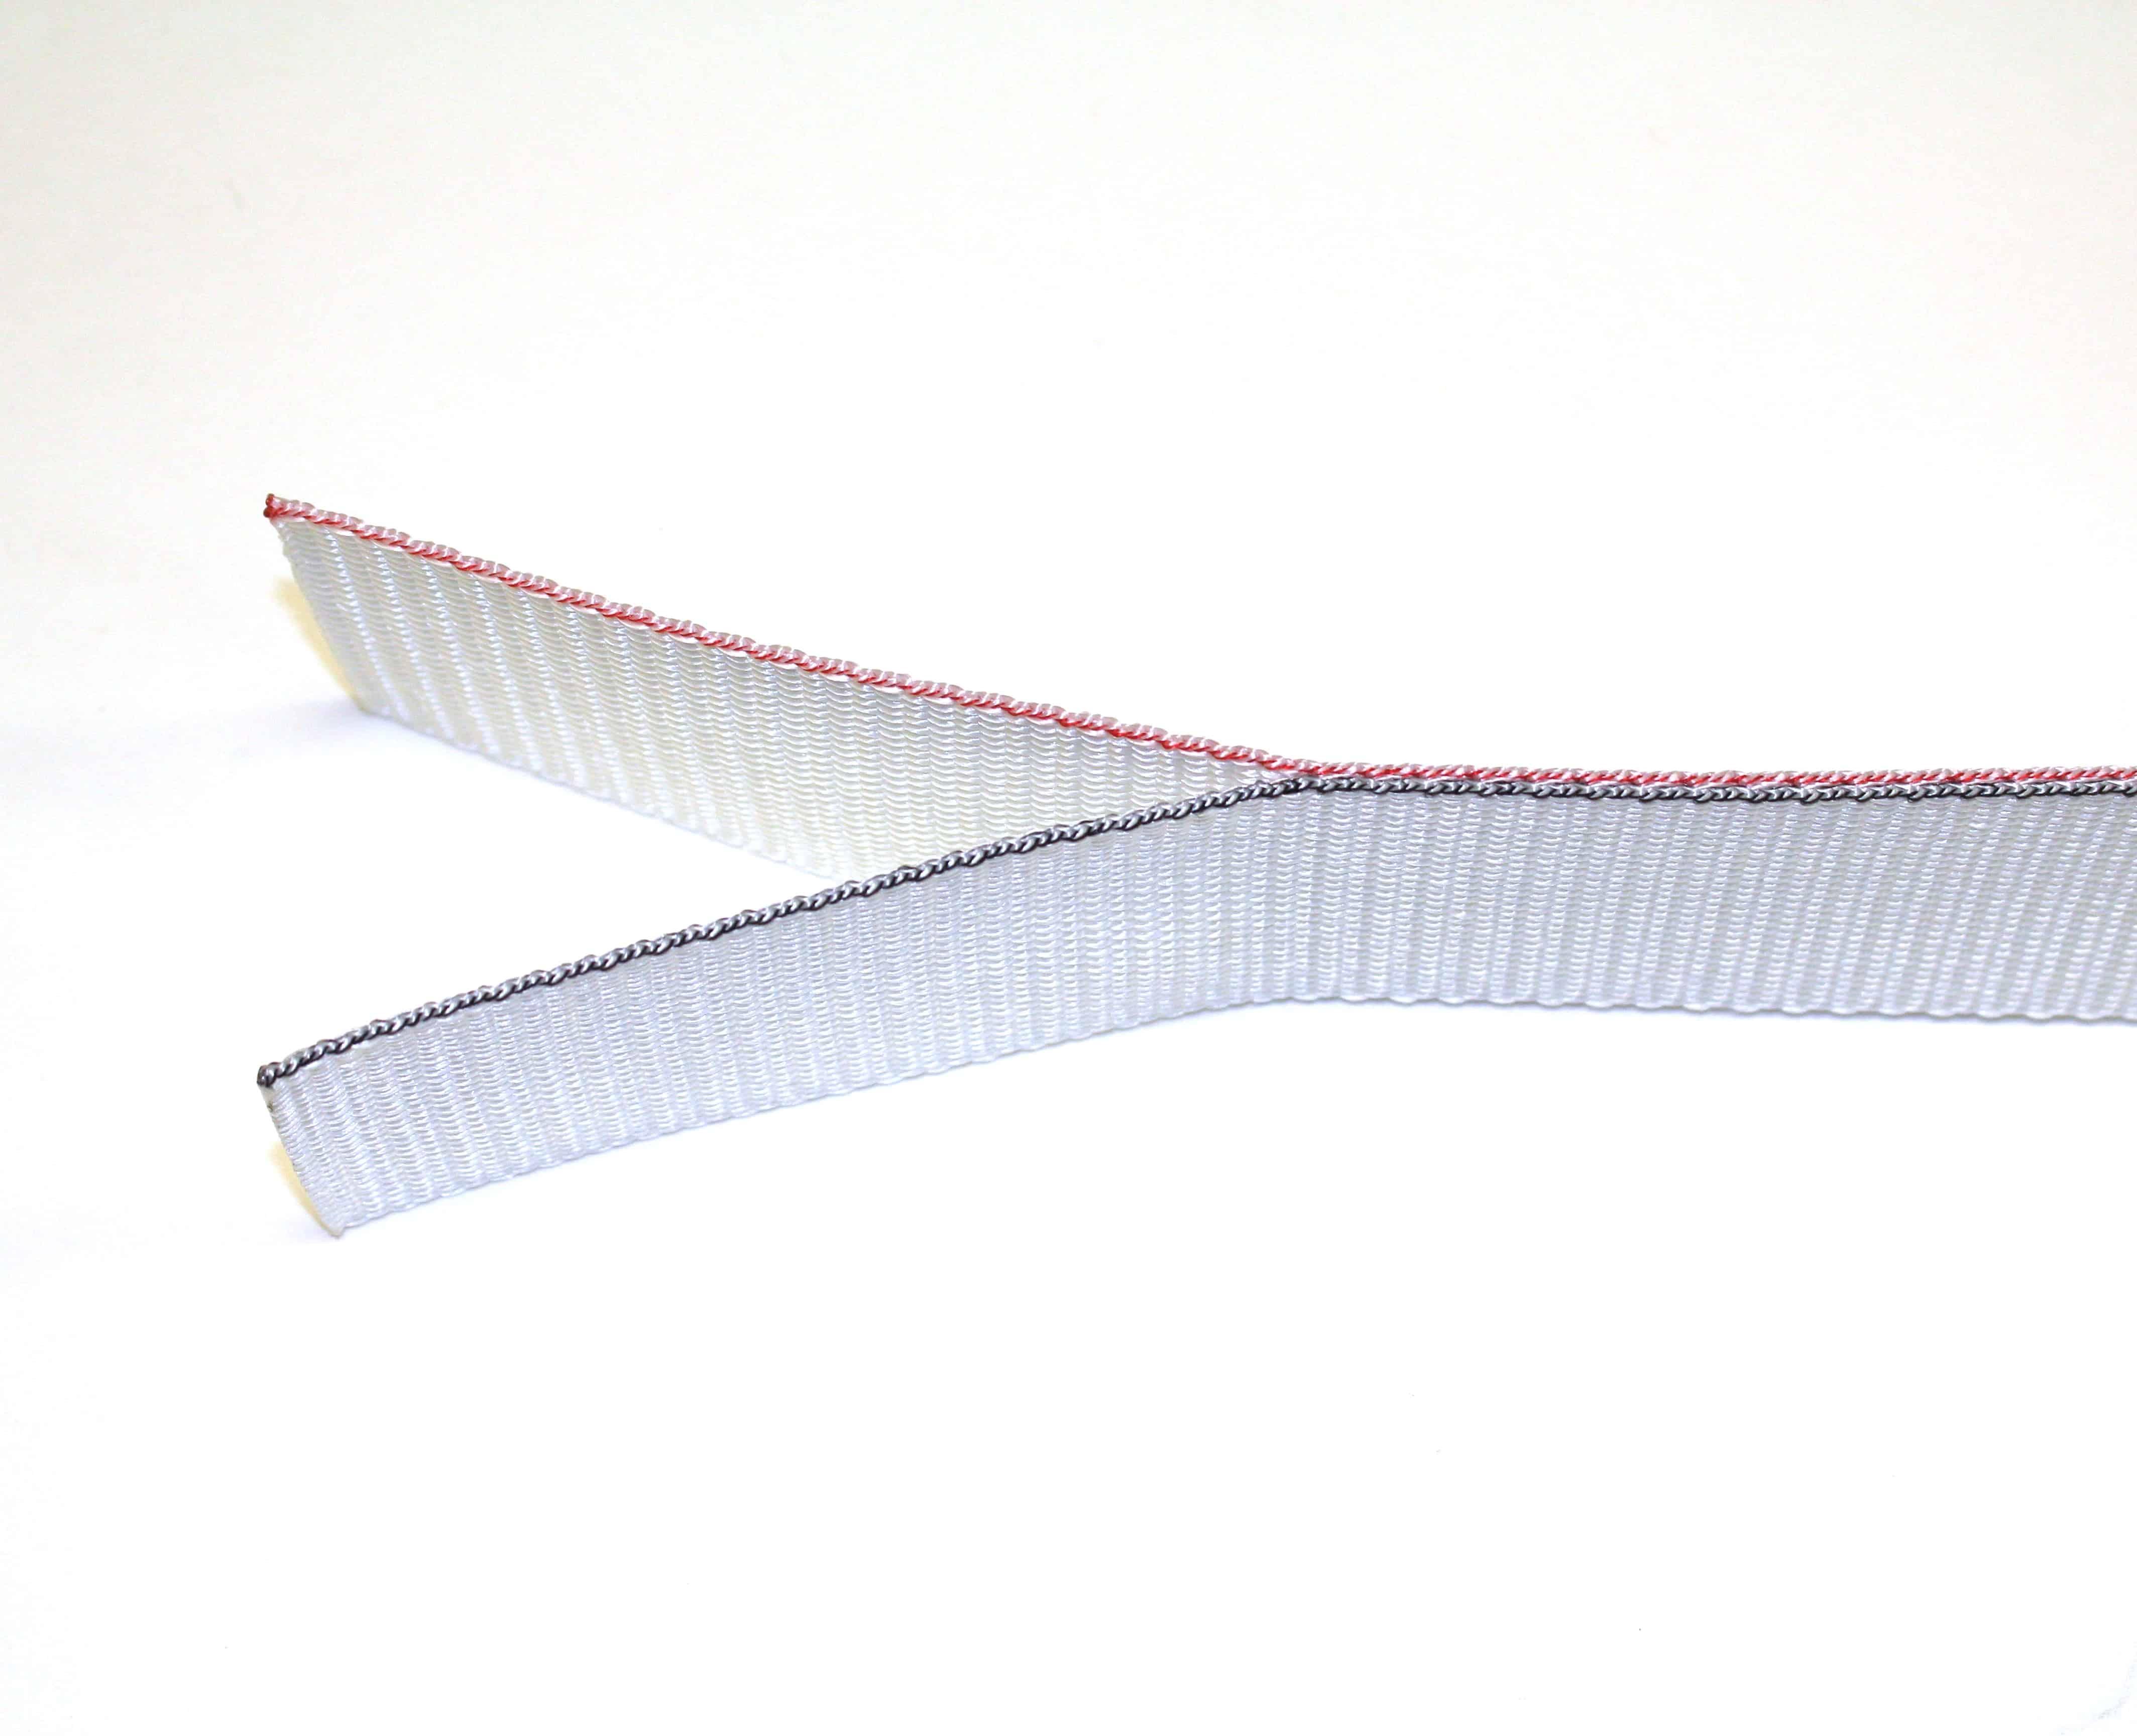 CSA Z259.11-05 Class E6 & ANSI Z359.13 6FT FF; 1.95″ Single Wing Natural Polyester Tear Webbing